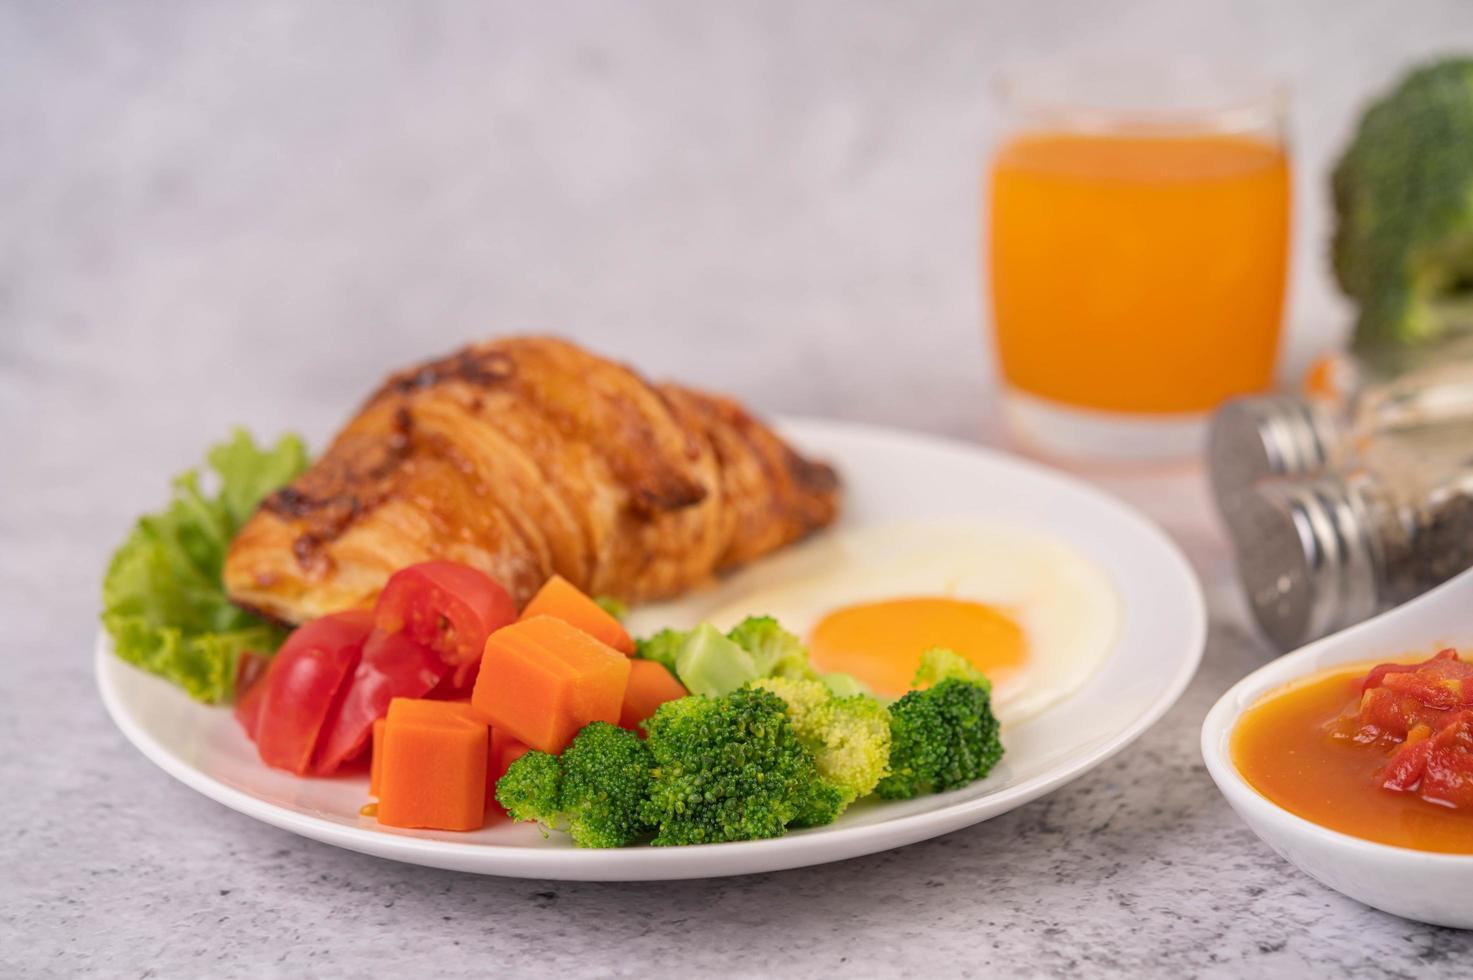 verse eiercroissant en plantaardig ontbijt foto